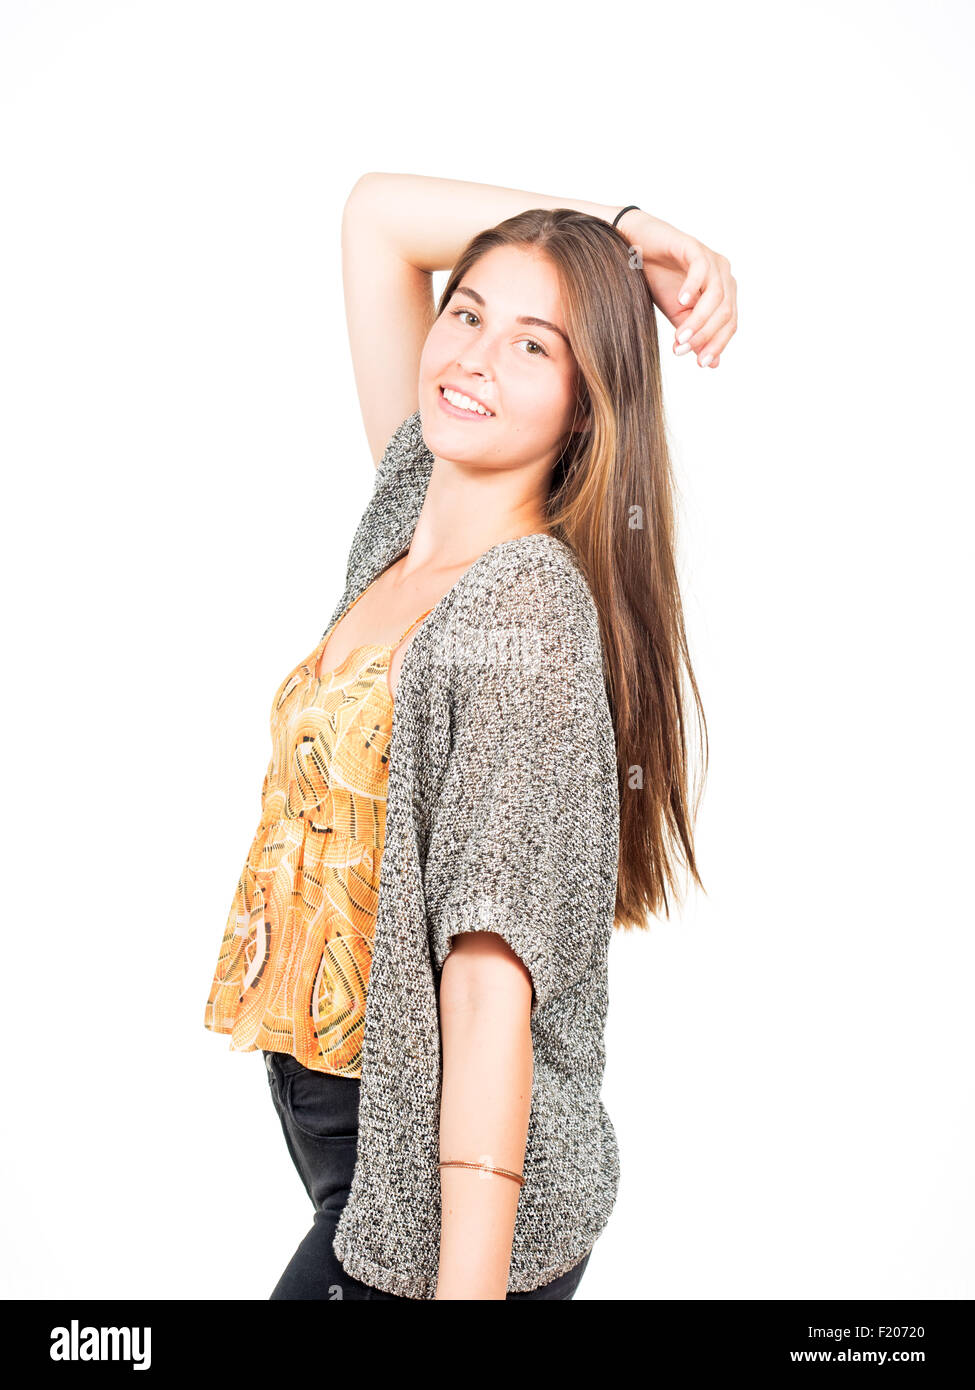 junge attraktive Frau posiert - Stock Image